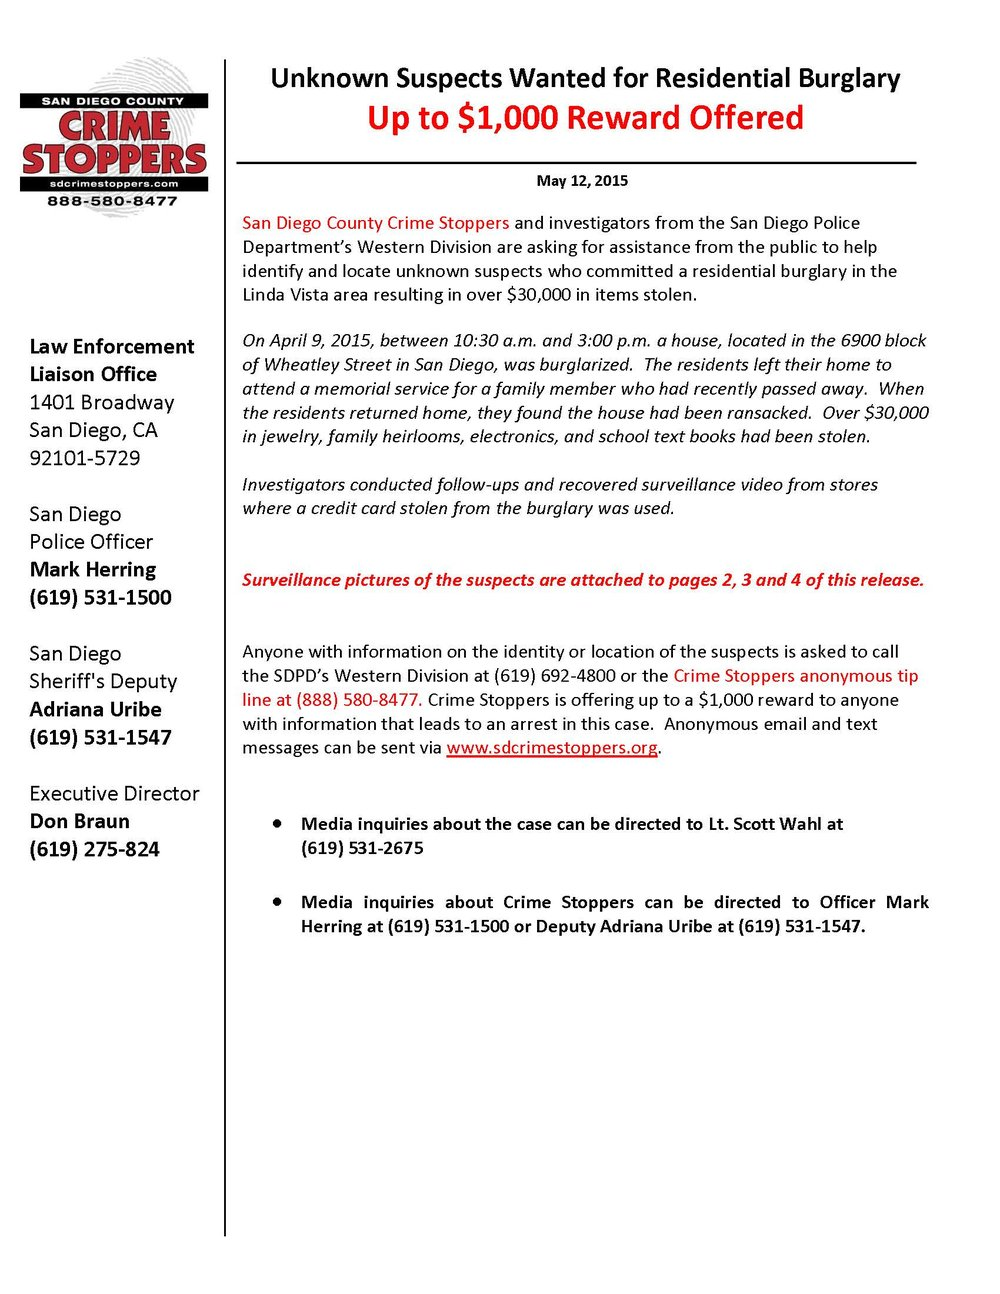 051215 Linda Vista Area Residential Burglary_Page_1